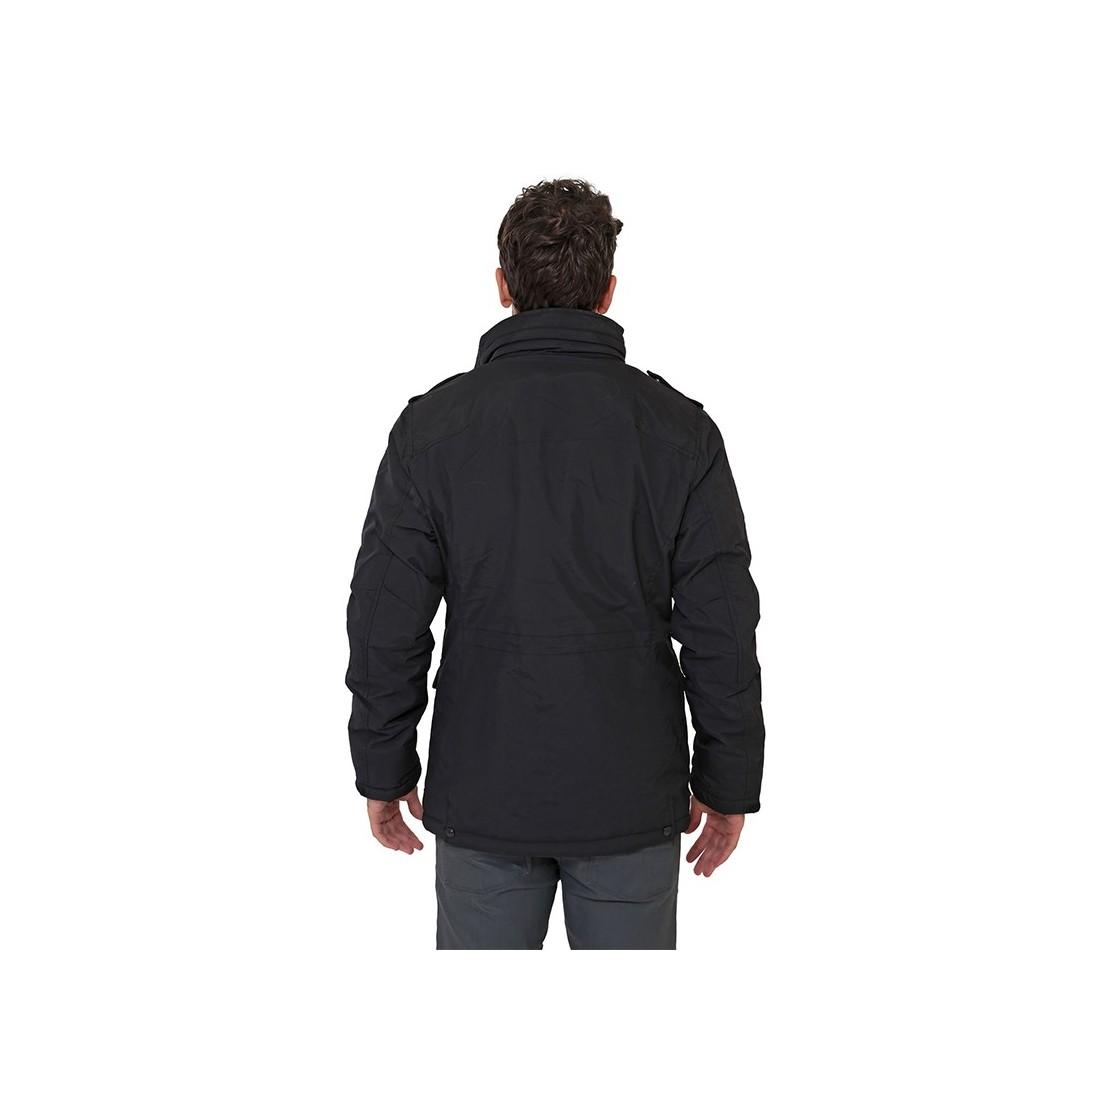 Noir De Schott En Field Homme Veste 34 Nylon nmwN8v0